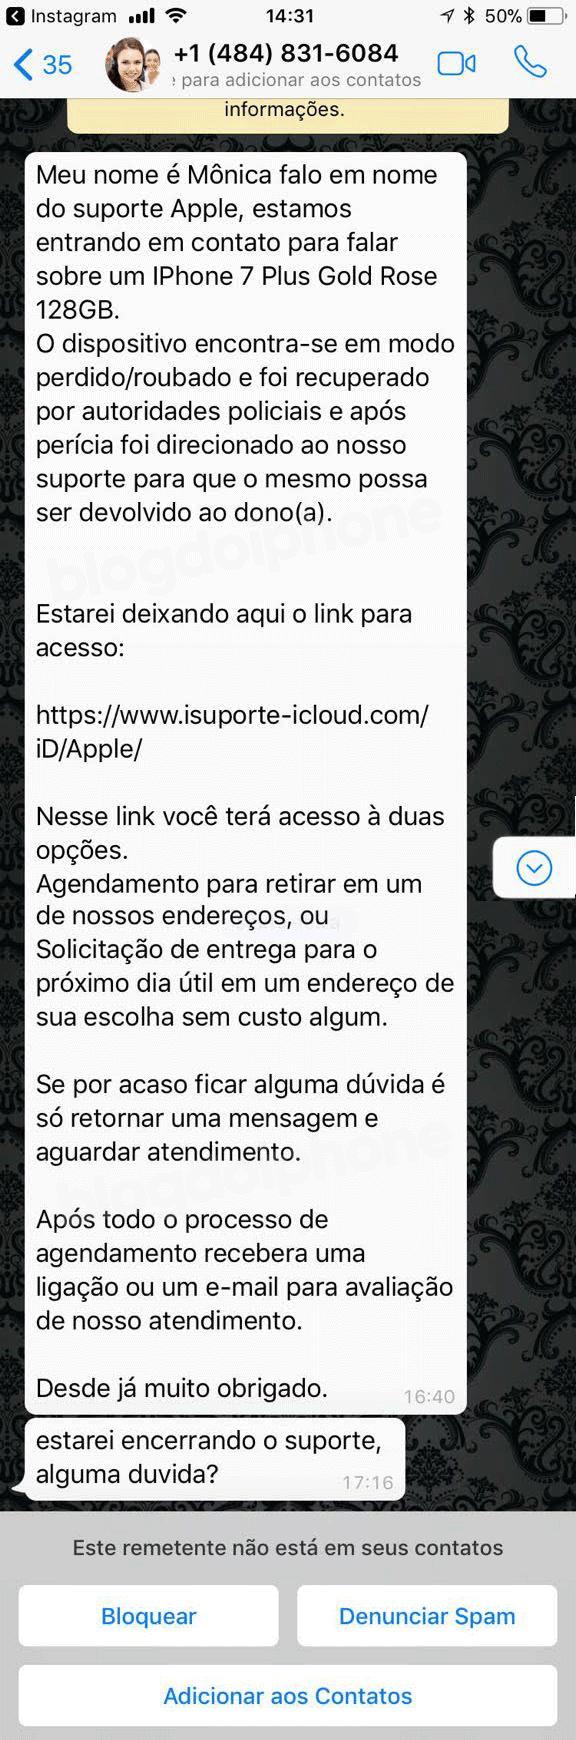 Mensagens fraudulentas no WhatsApp